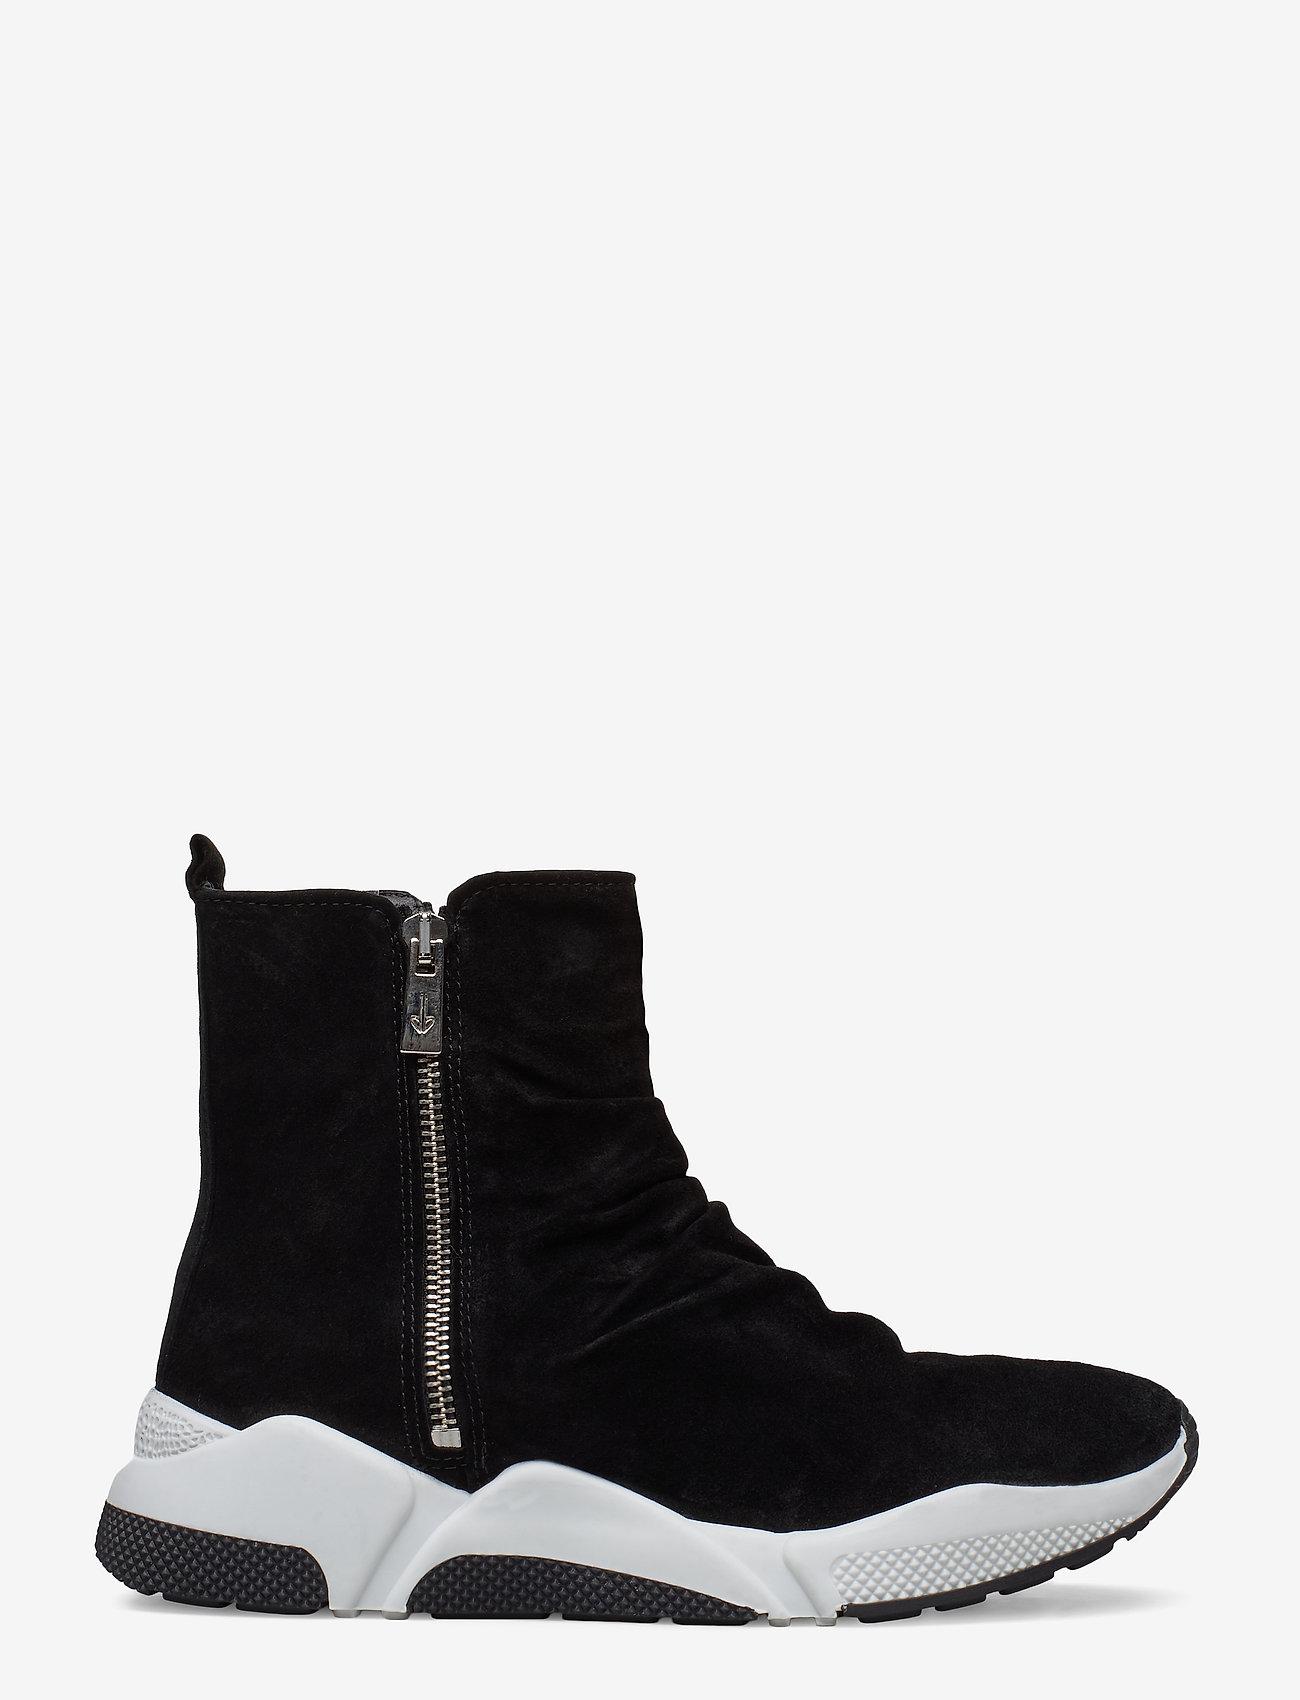 Billi Bi - Sport 4865 - sneakers med høy ankel - black babysilk suede 500 - 1